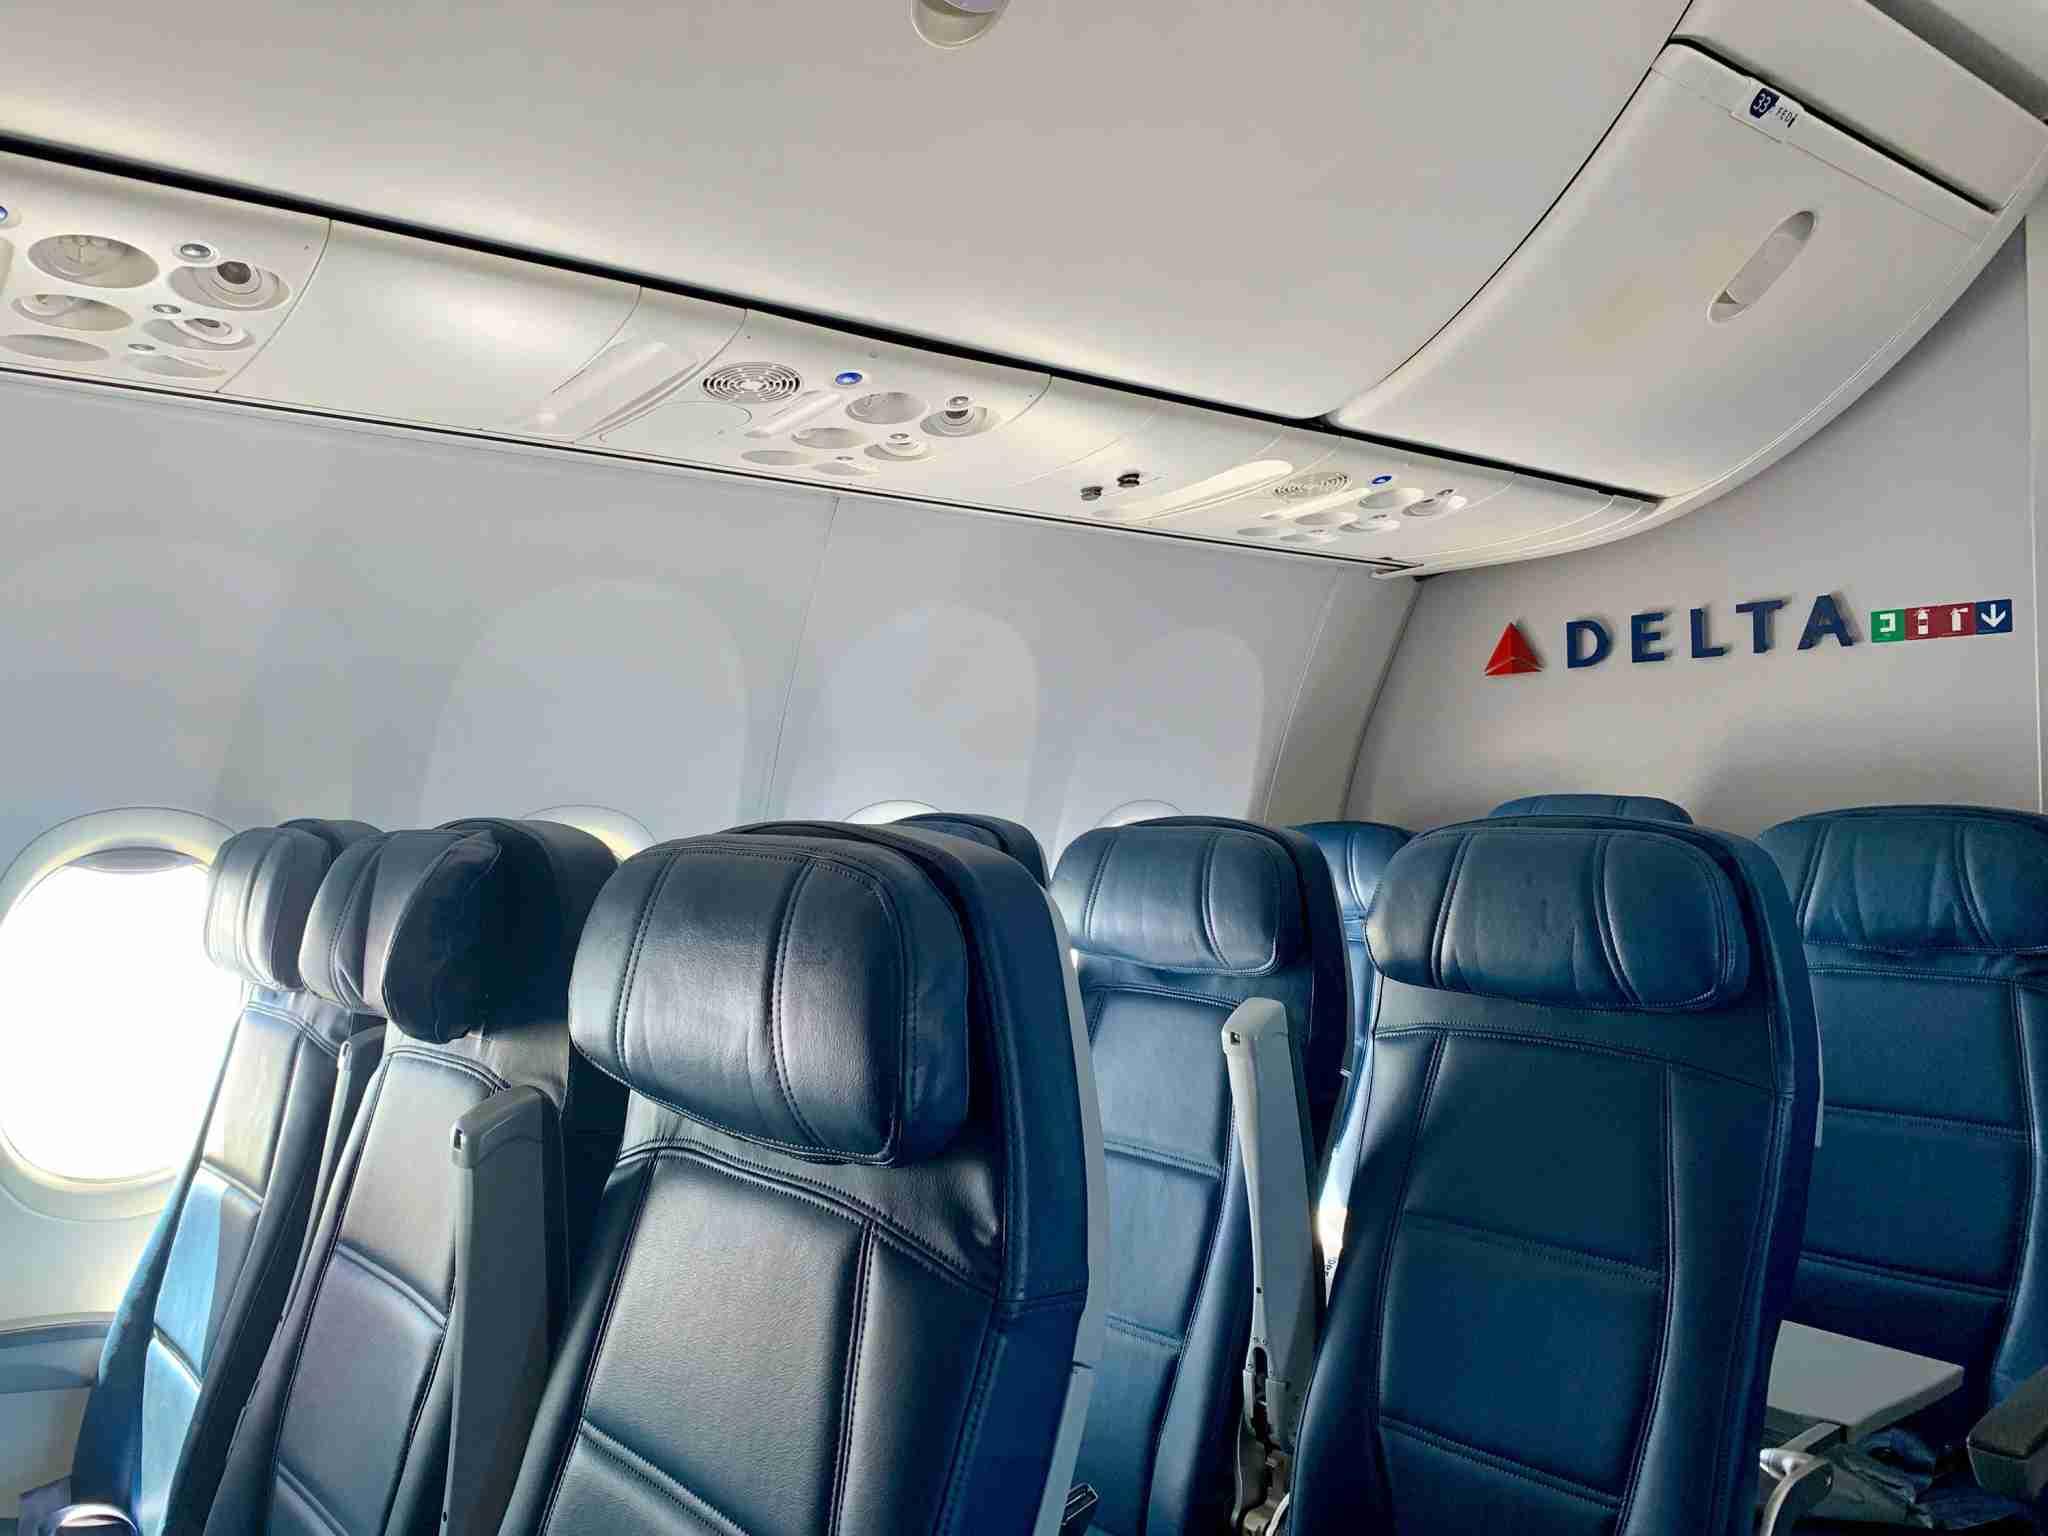 delta-back-rear-economy-main-cabin-seat-seating-airplane-cabin